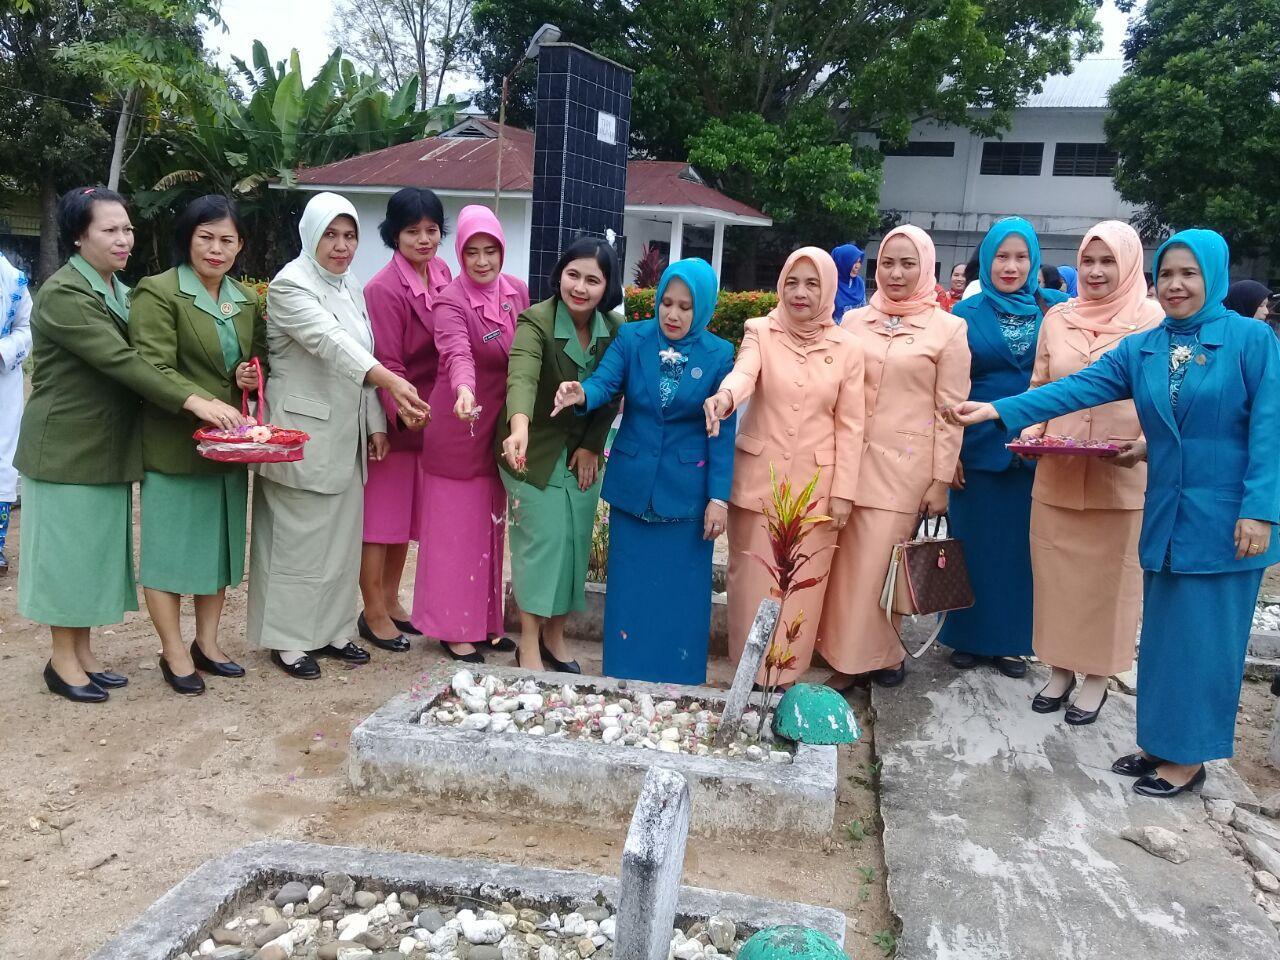 Peringati Hari Kartini, Organisasi Wanita Labuhanbatu Ziarah ke Makam Pahlawan